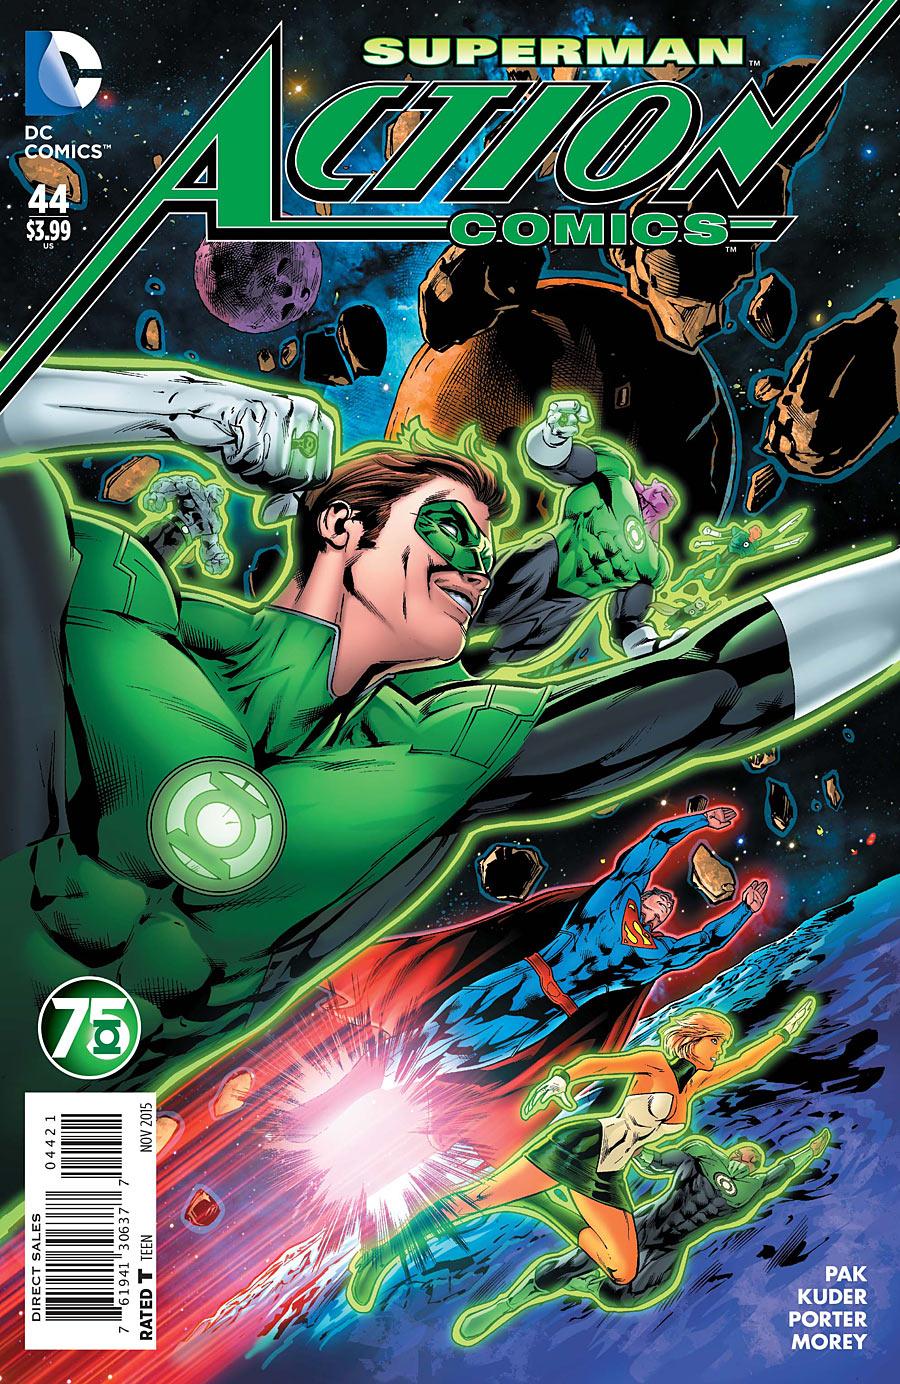 Action Comics Vol 2 44 Green Lantern 75th Anniversary Variant.jpg